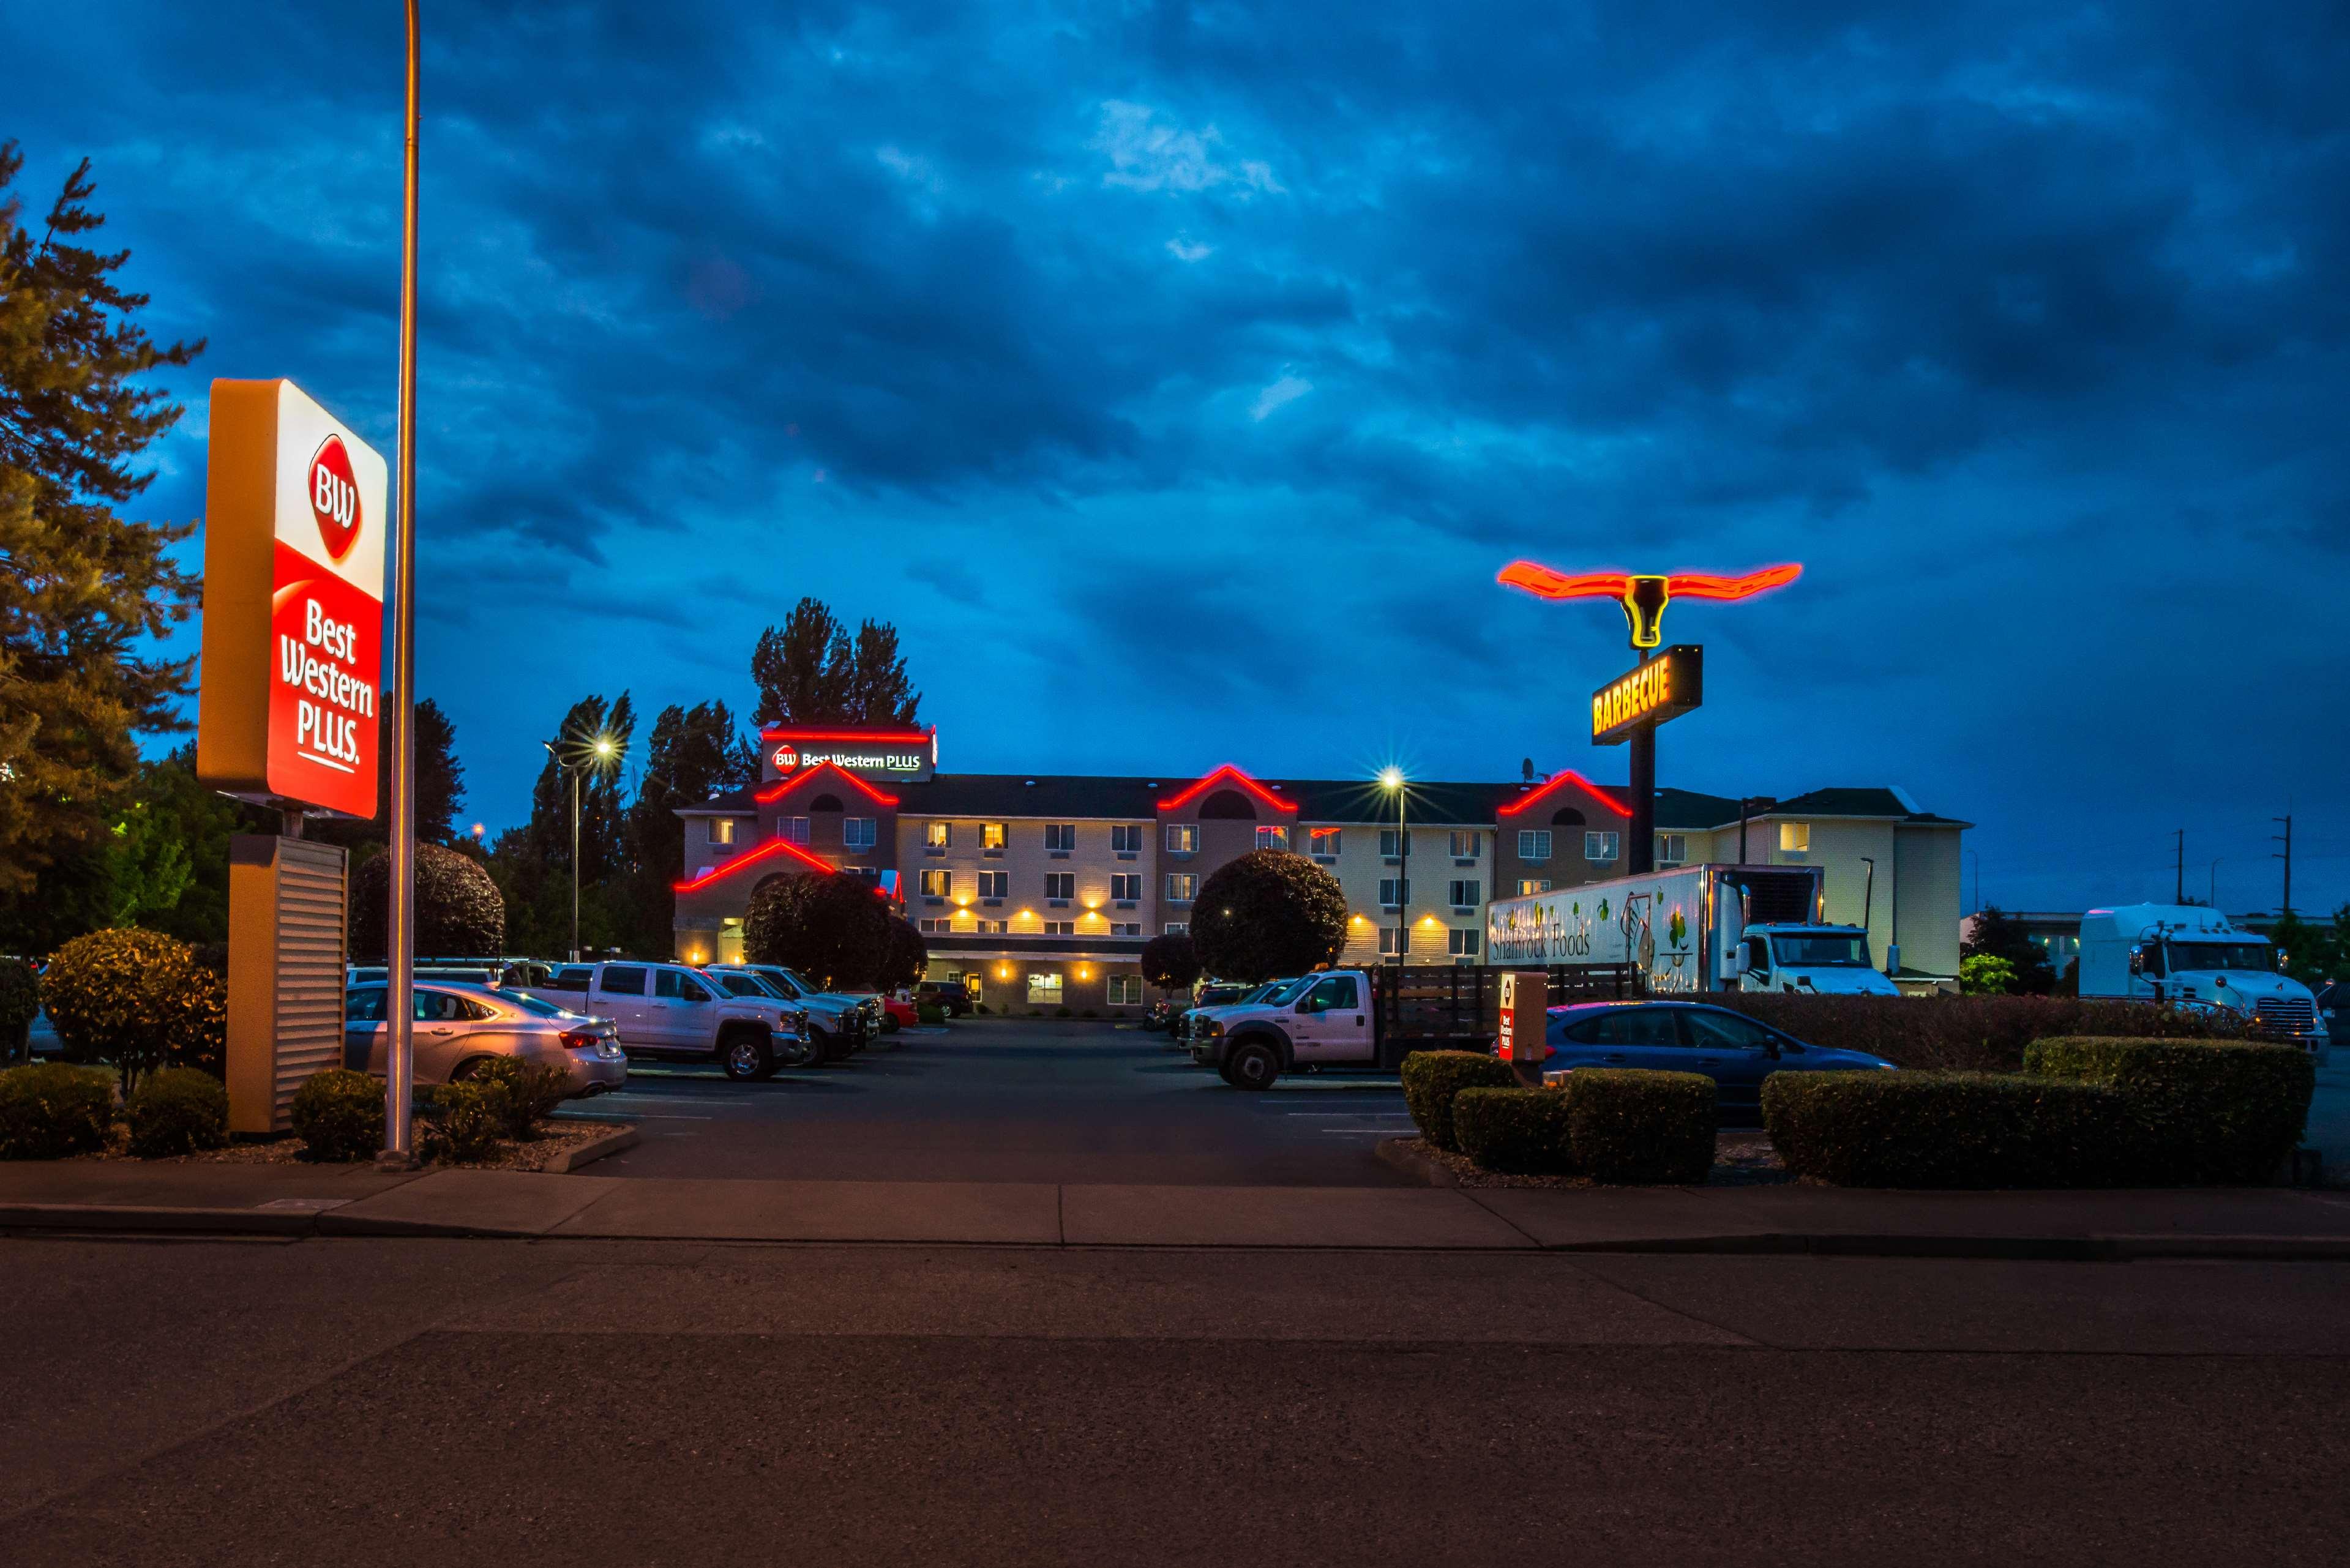 Best Western Plus Mountain View Auburn Inn image 3